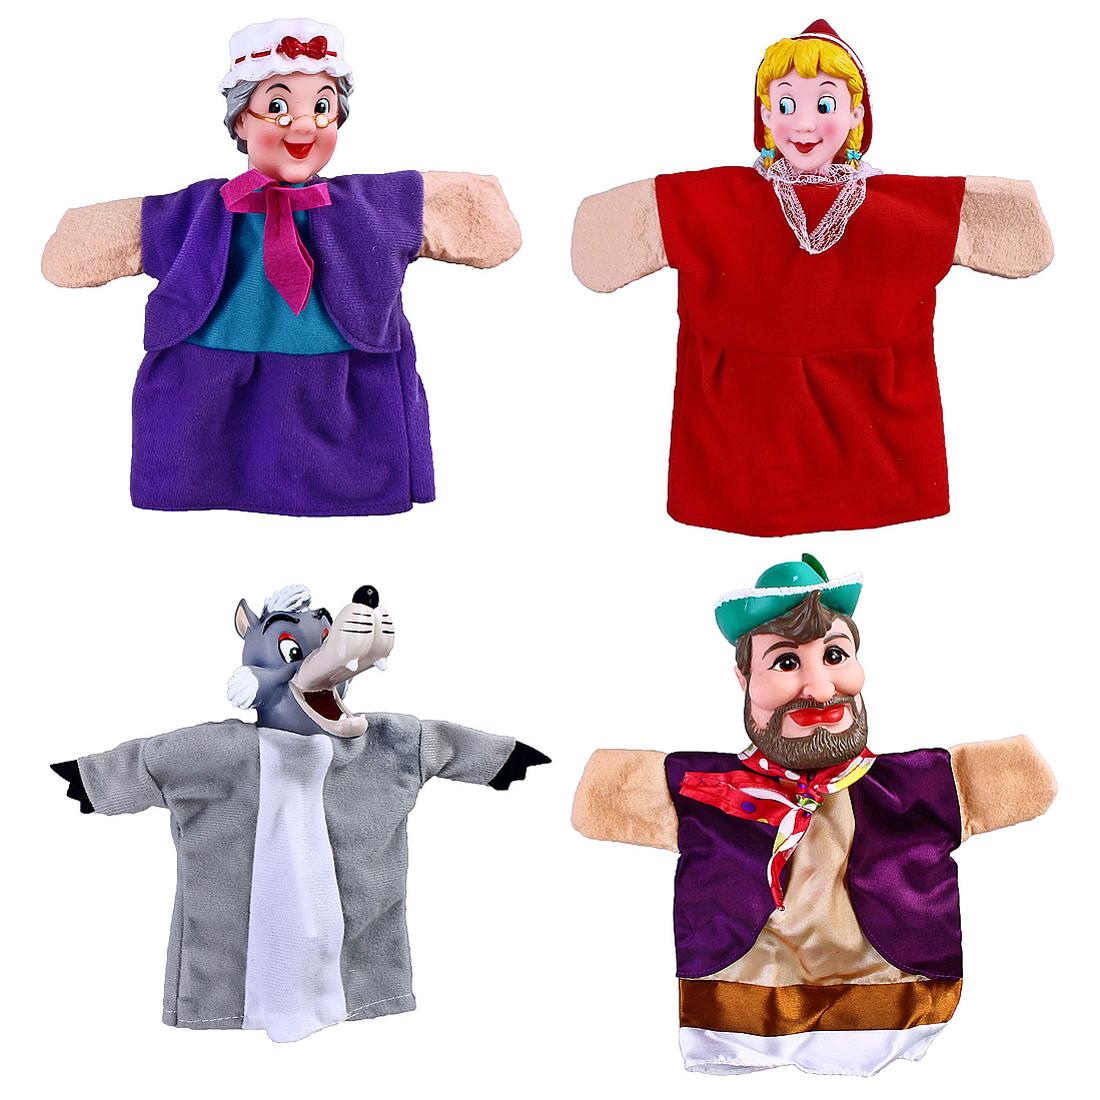 Кукольный театр Наша игрушка Красная шапочка жирафики кукольный театр курочка ряба 4 куклы 68320